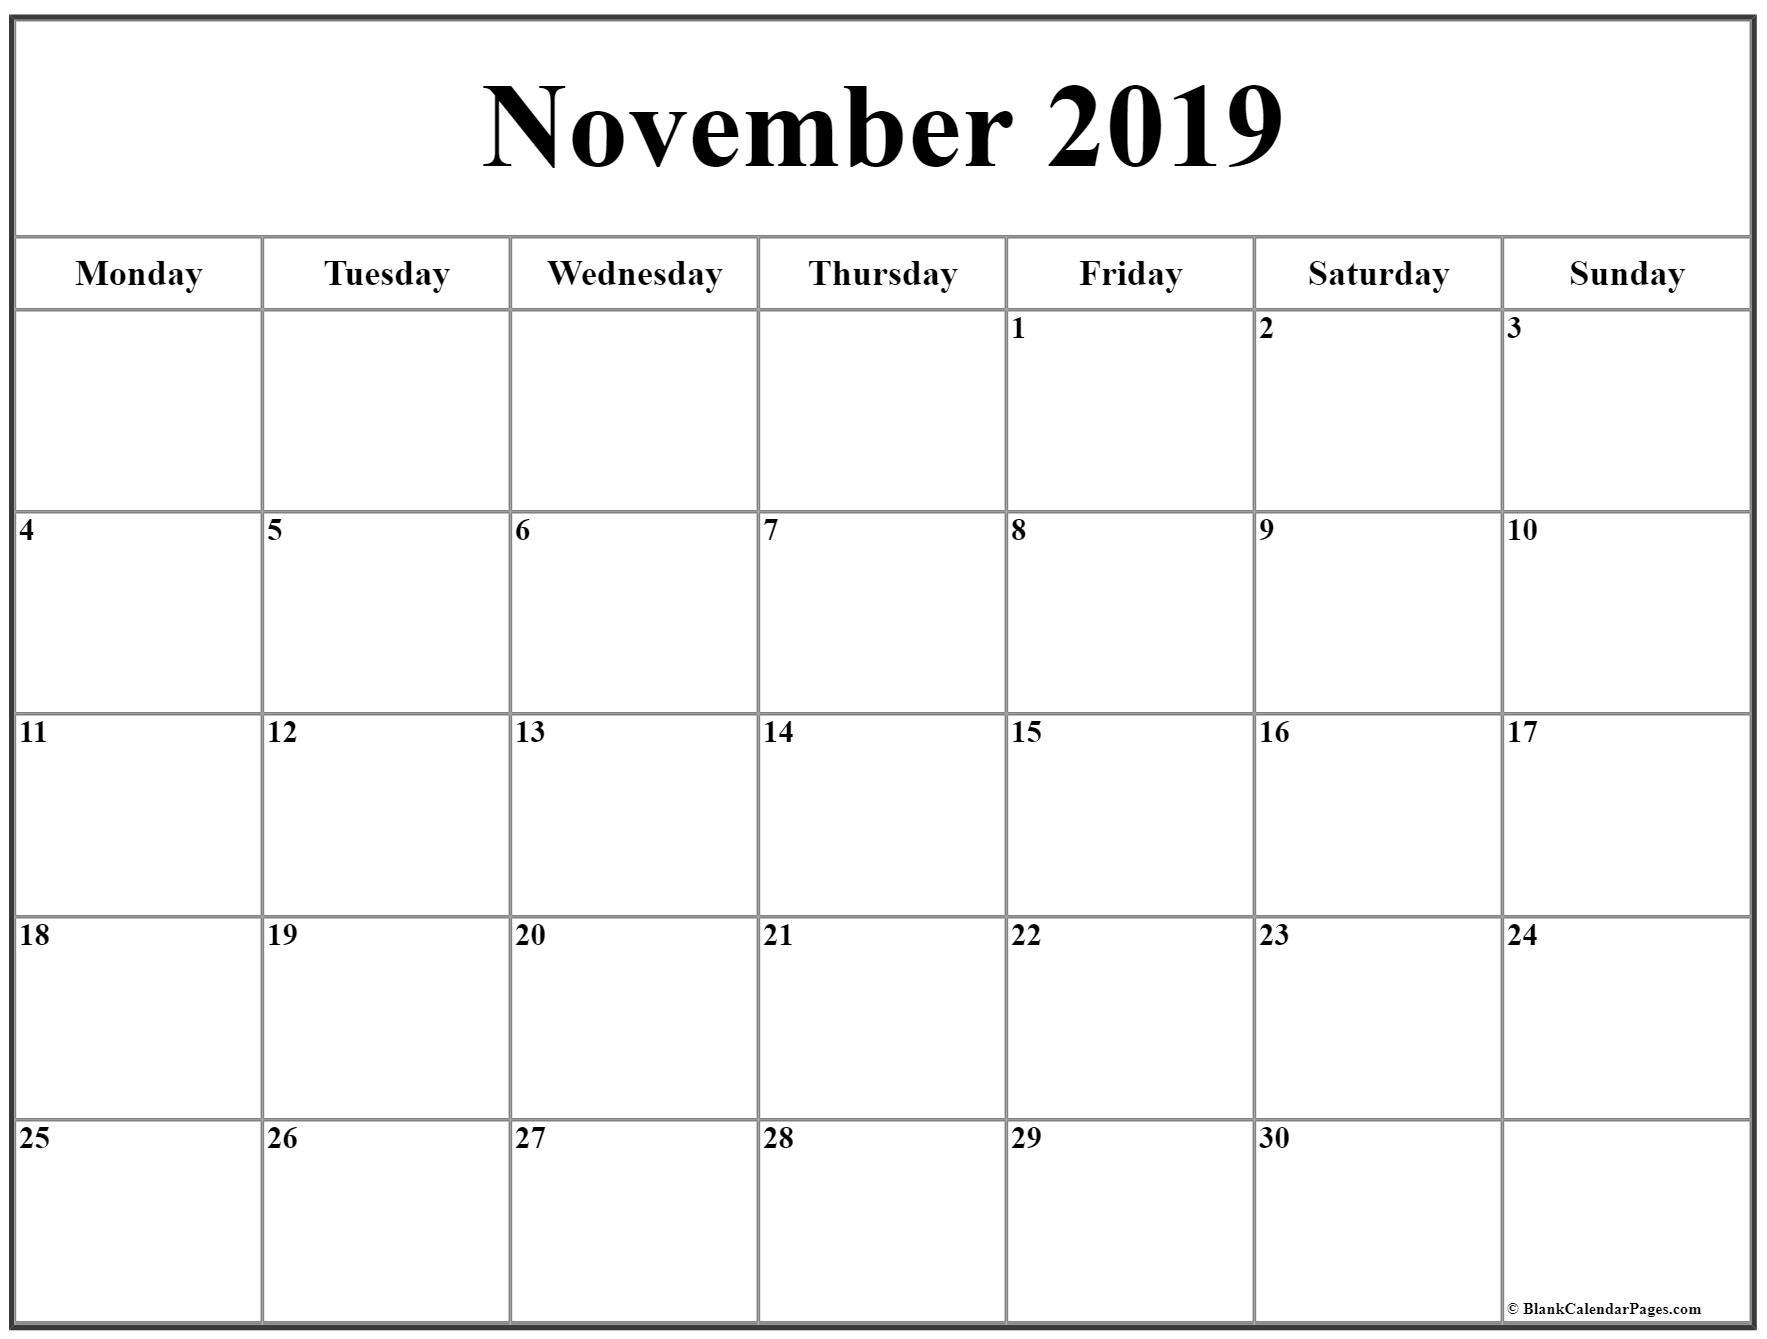 November 2019 Monday Calendar | Monday To Sunday throughout Printable Calendar Monday To Sunday